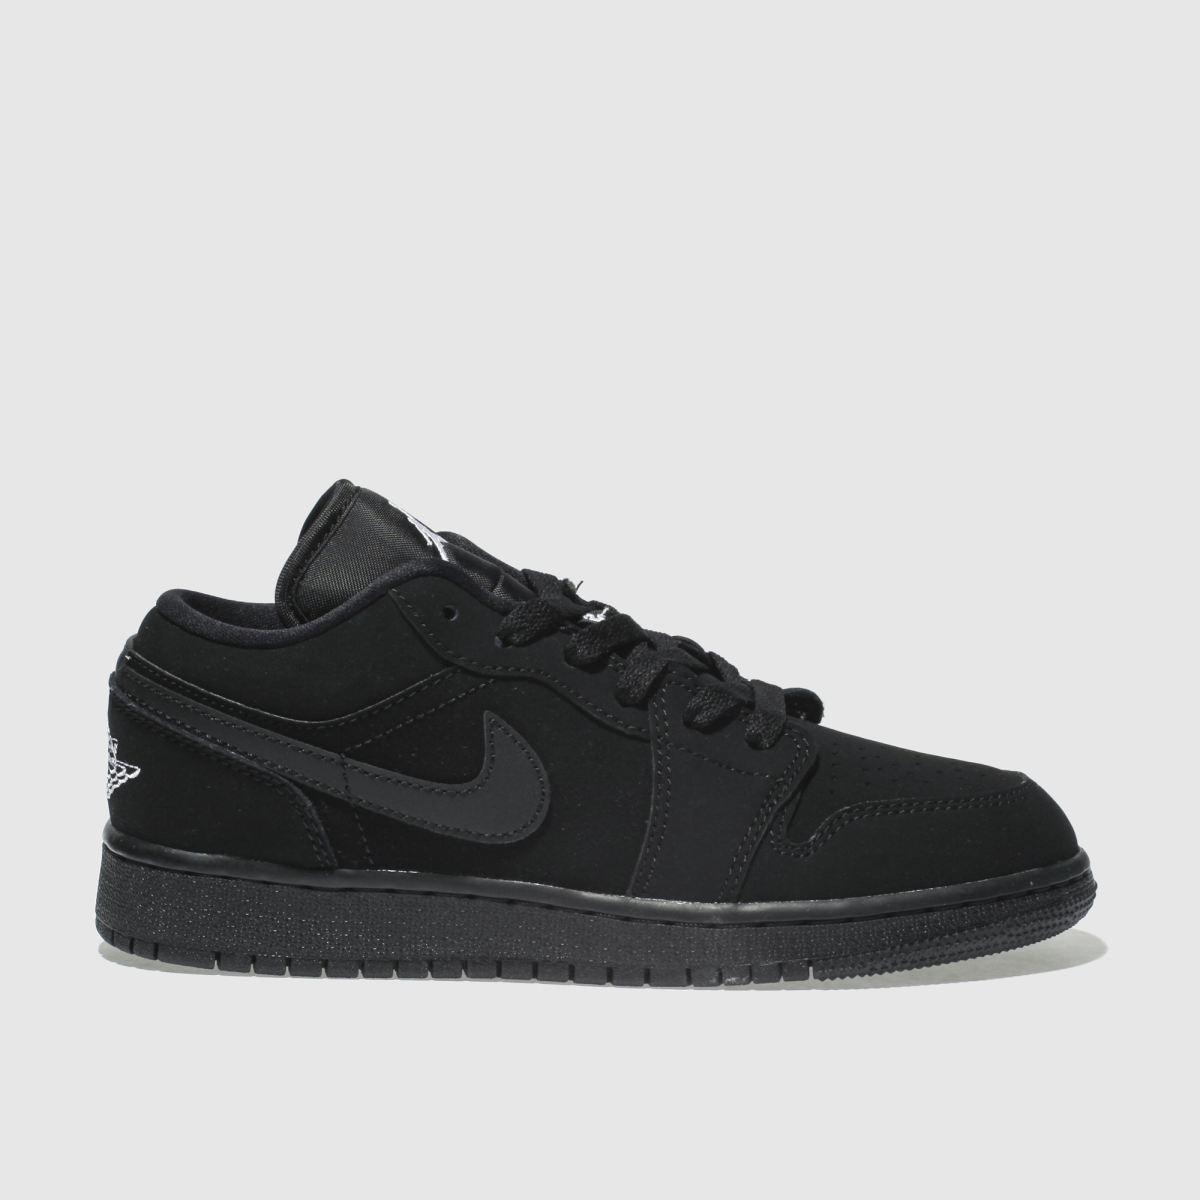 Nike Jordan Black & White Nike Jordan 1 Low Trainers Youth